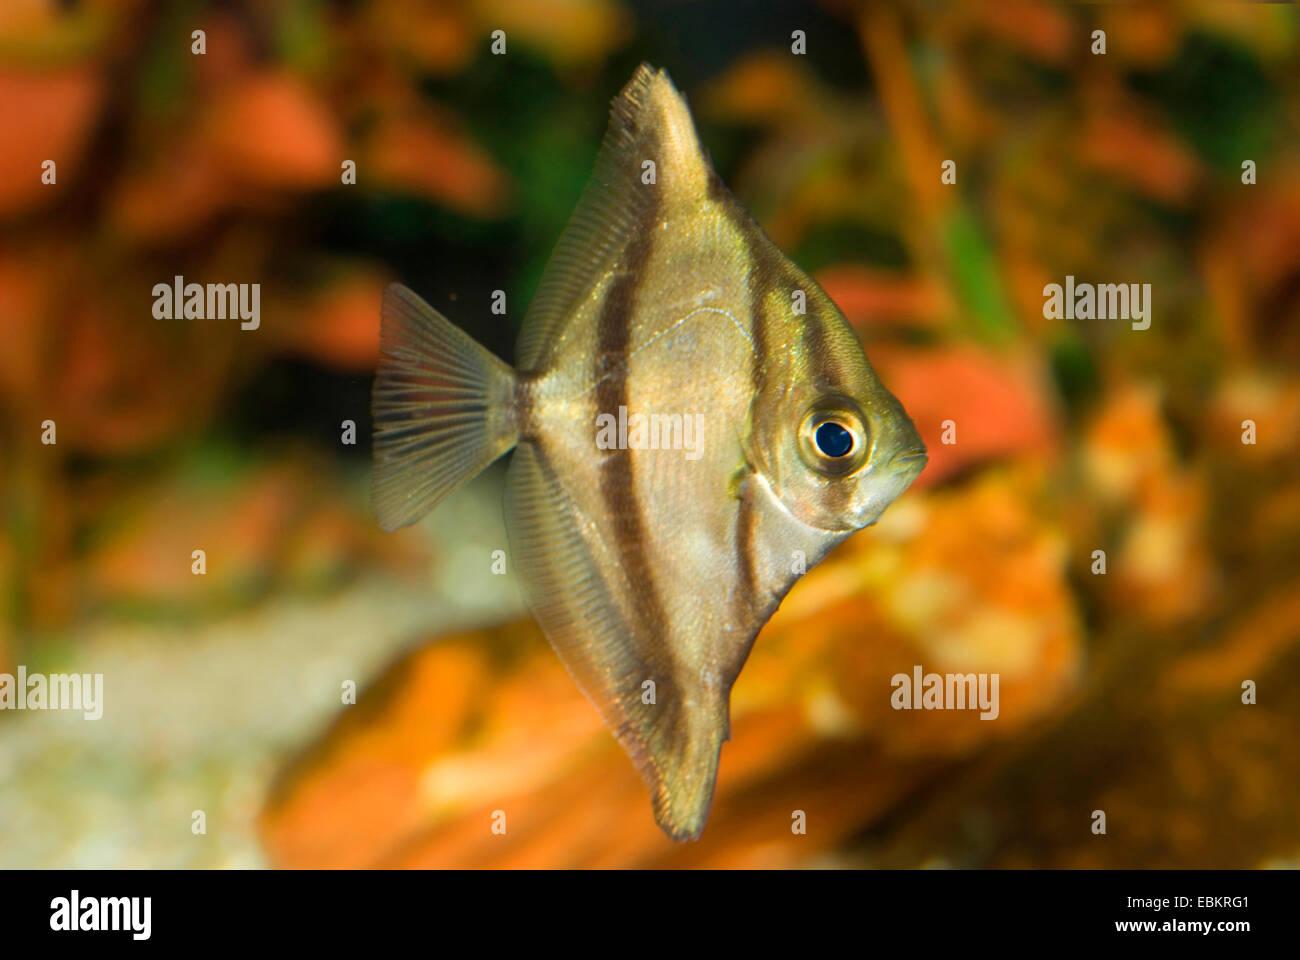 African Mono, Striped Mono, African Finger fish (Psettus sebae, Monodactylus sebae), swimming - Stock Image